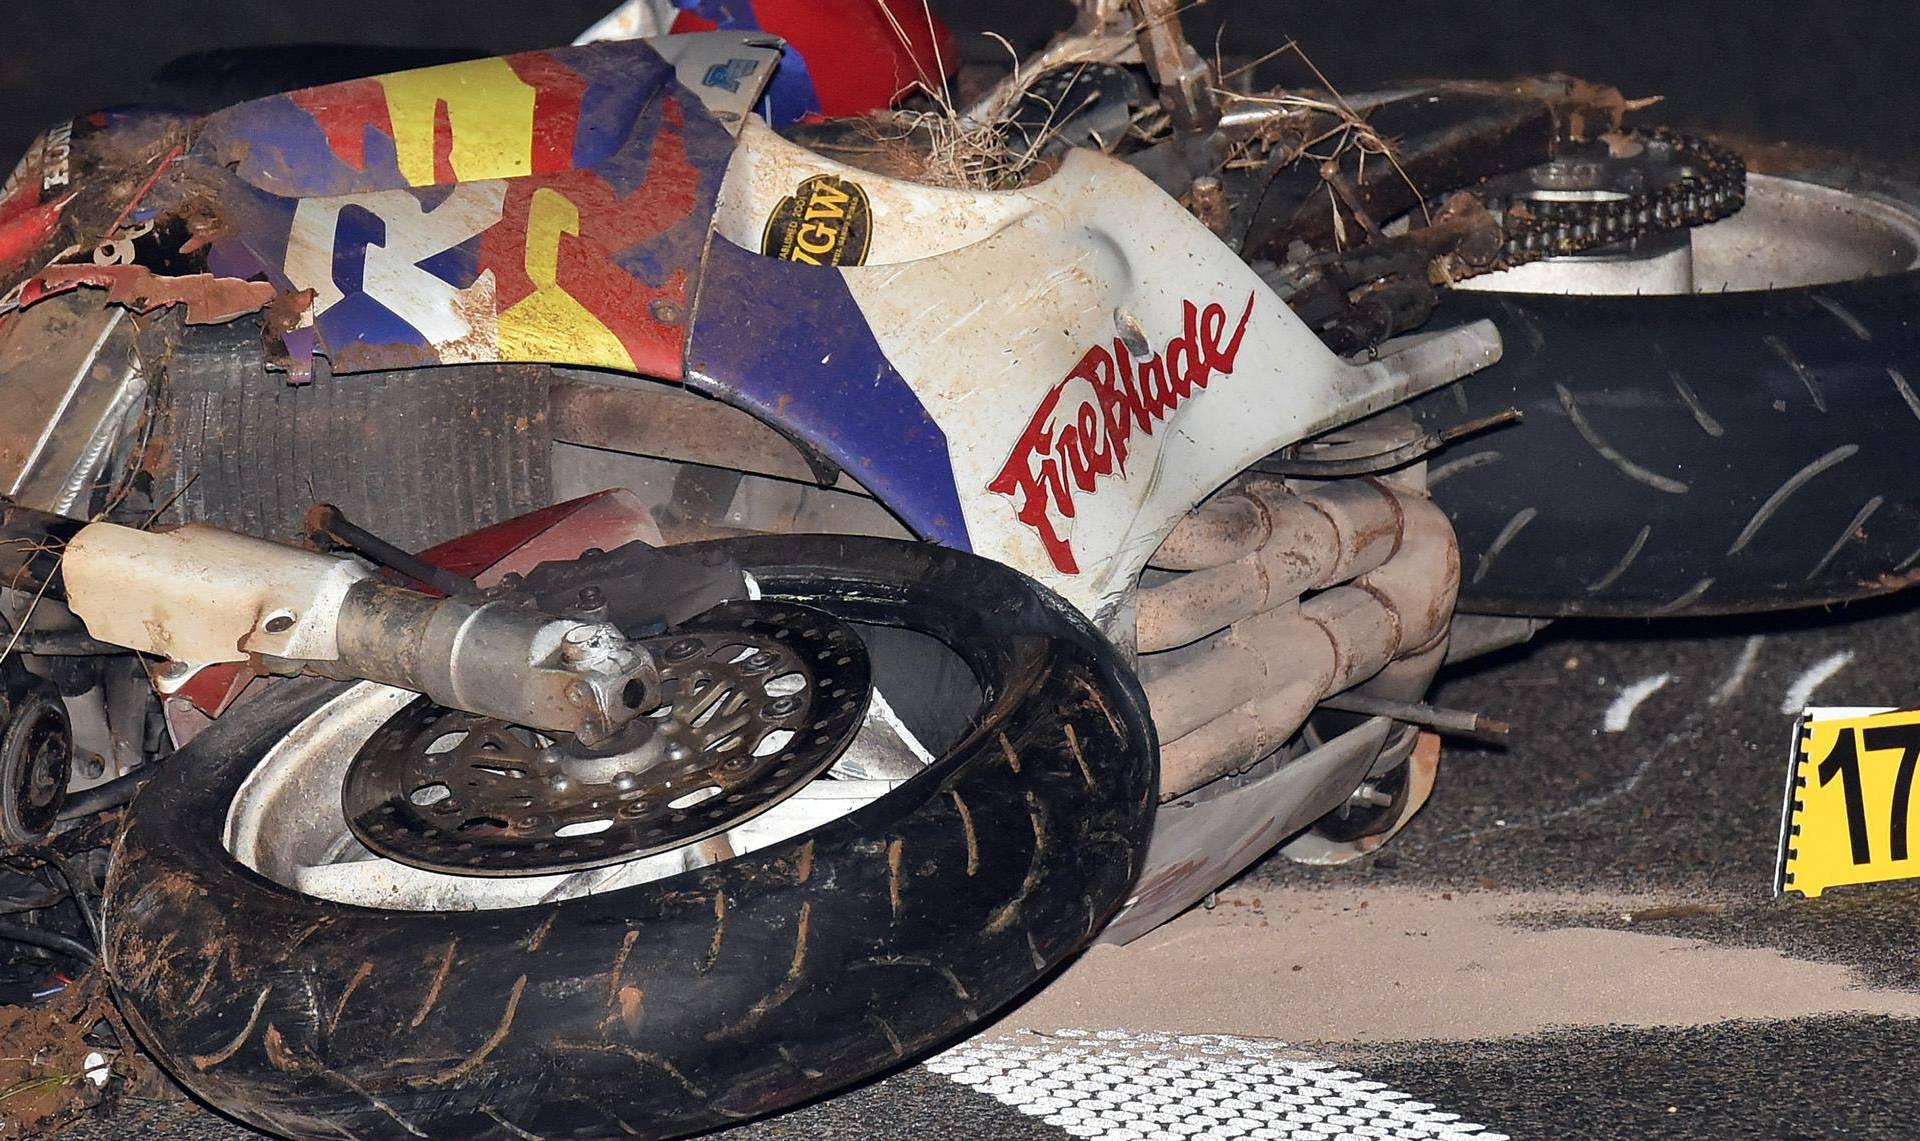 Motociklist sletio s ceste, od zadobivenih ozljeda preminuo